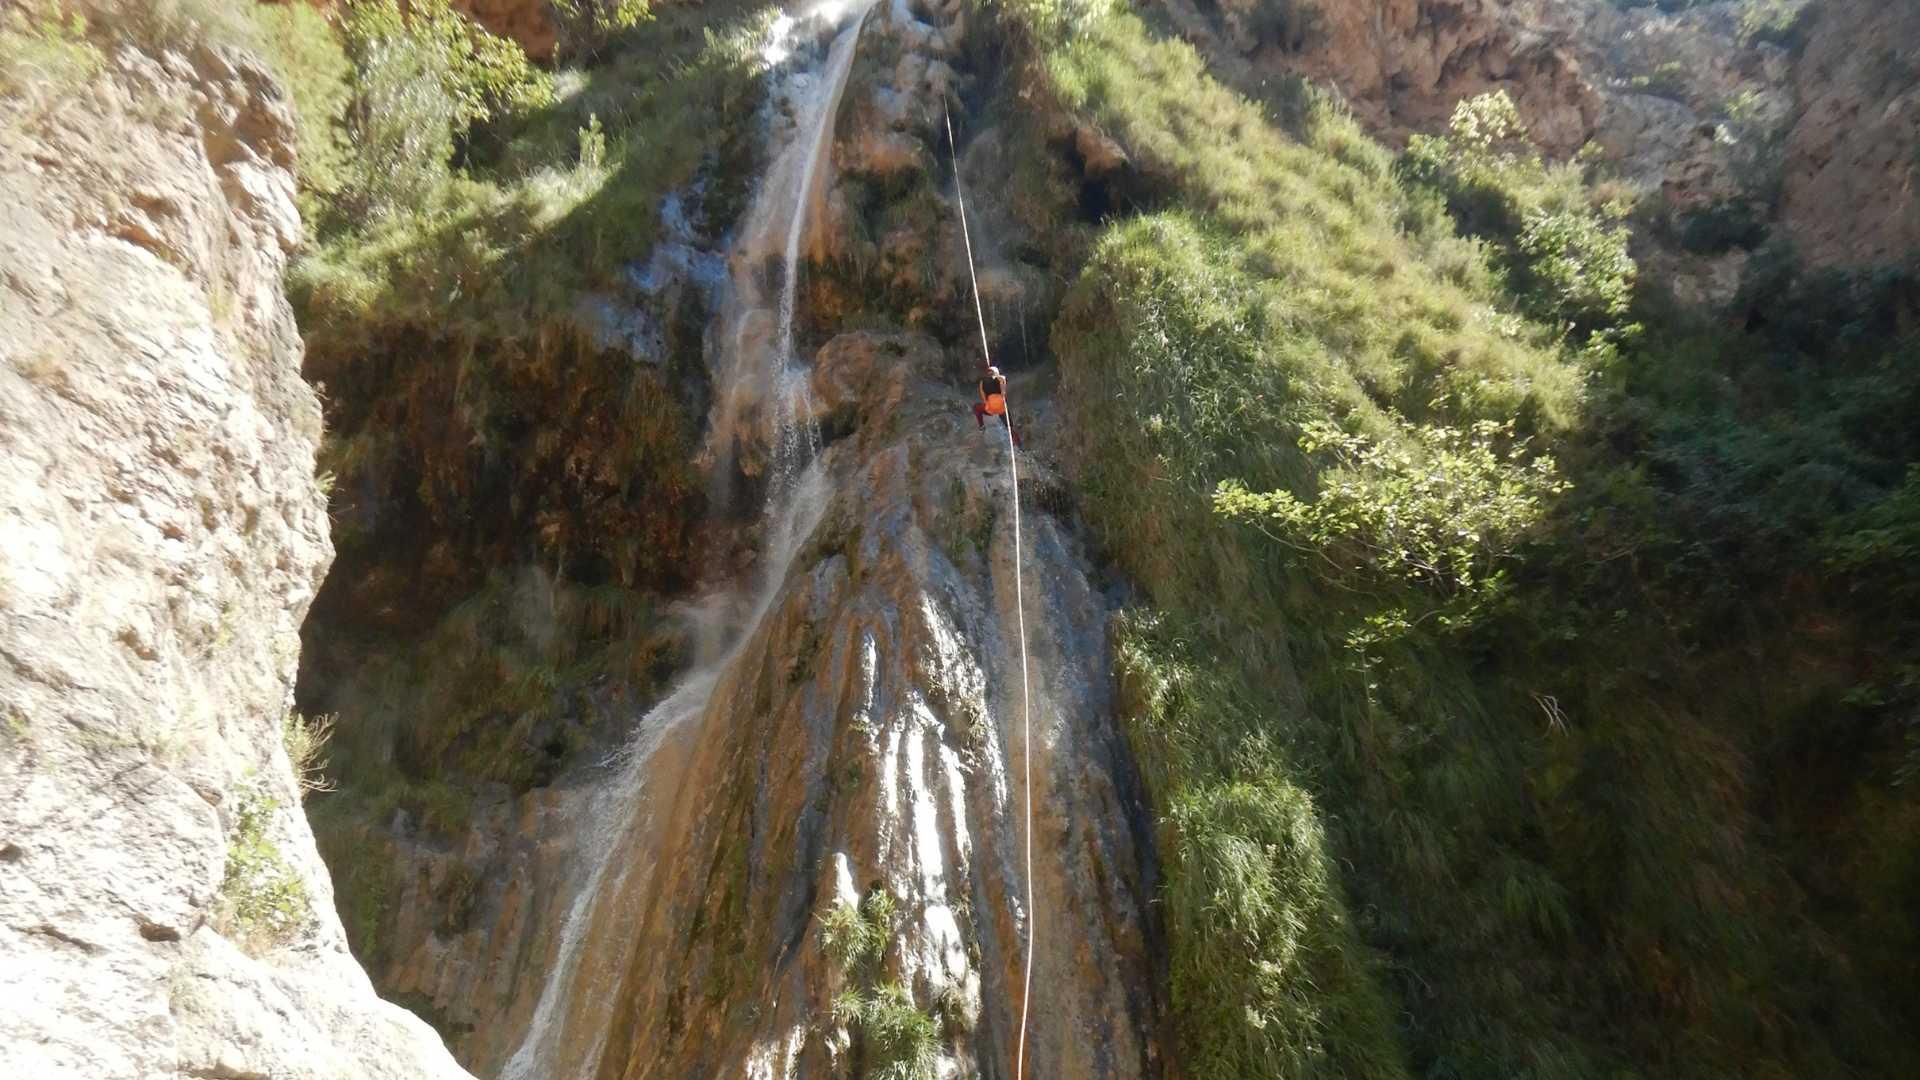 Otonel gorge